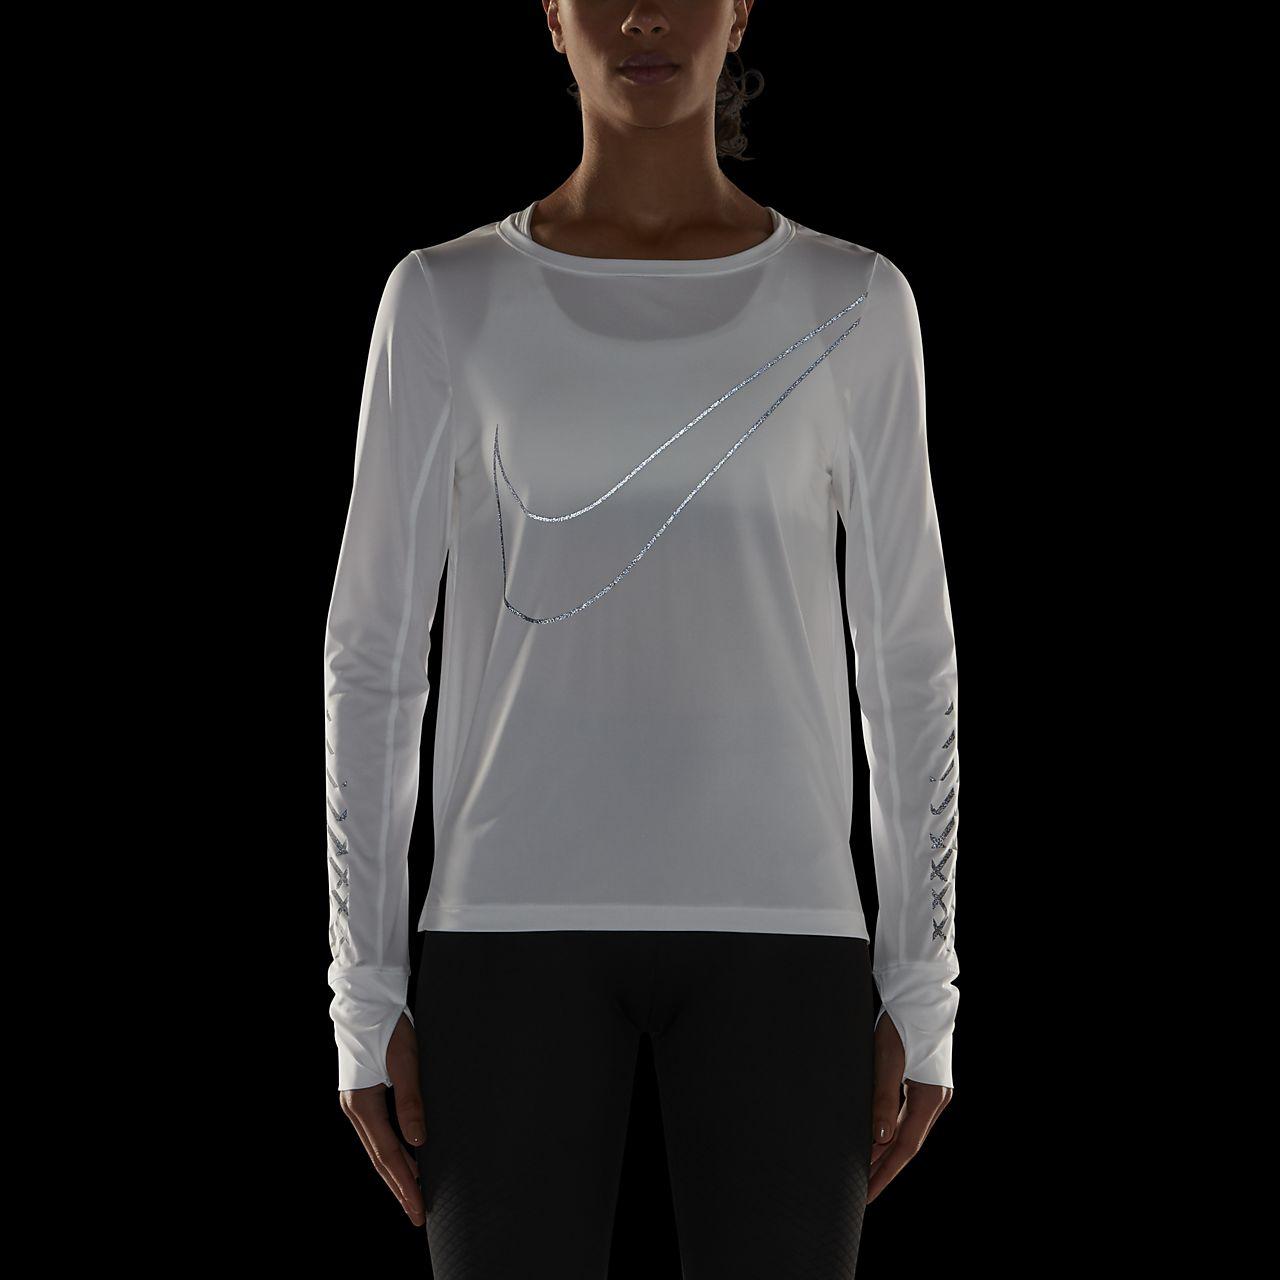 ... Nike Breathe (City) Women's Long-Sleeve Running Top